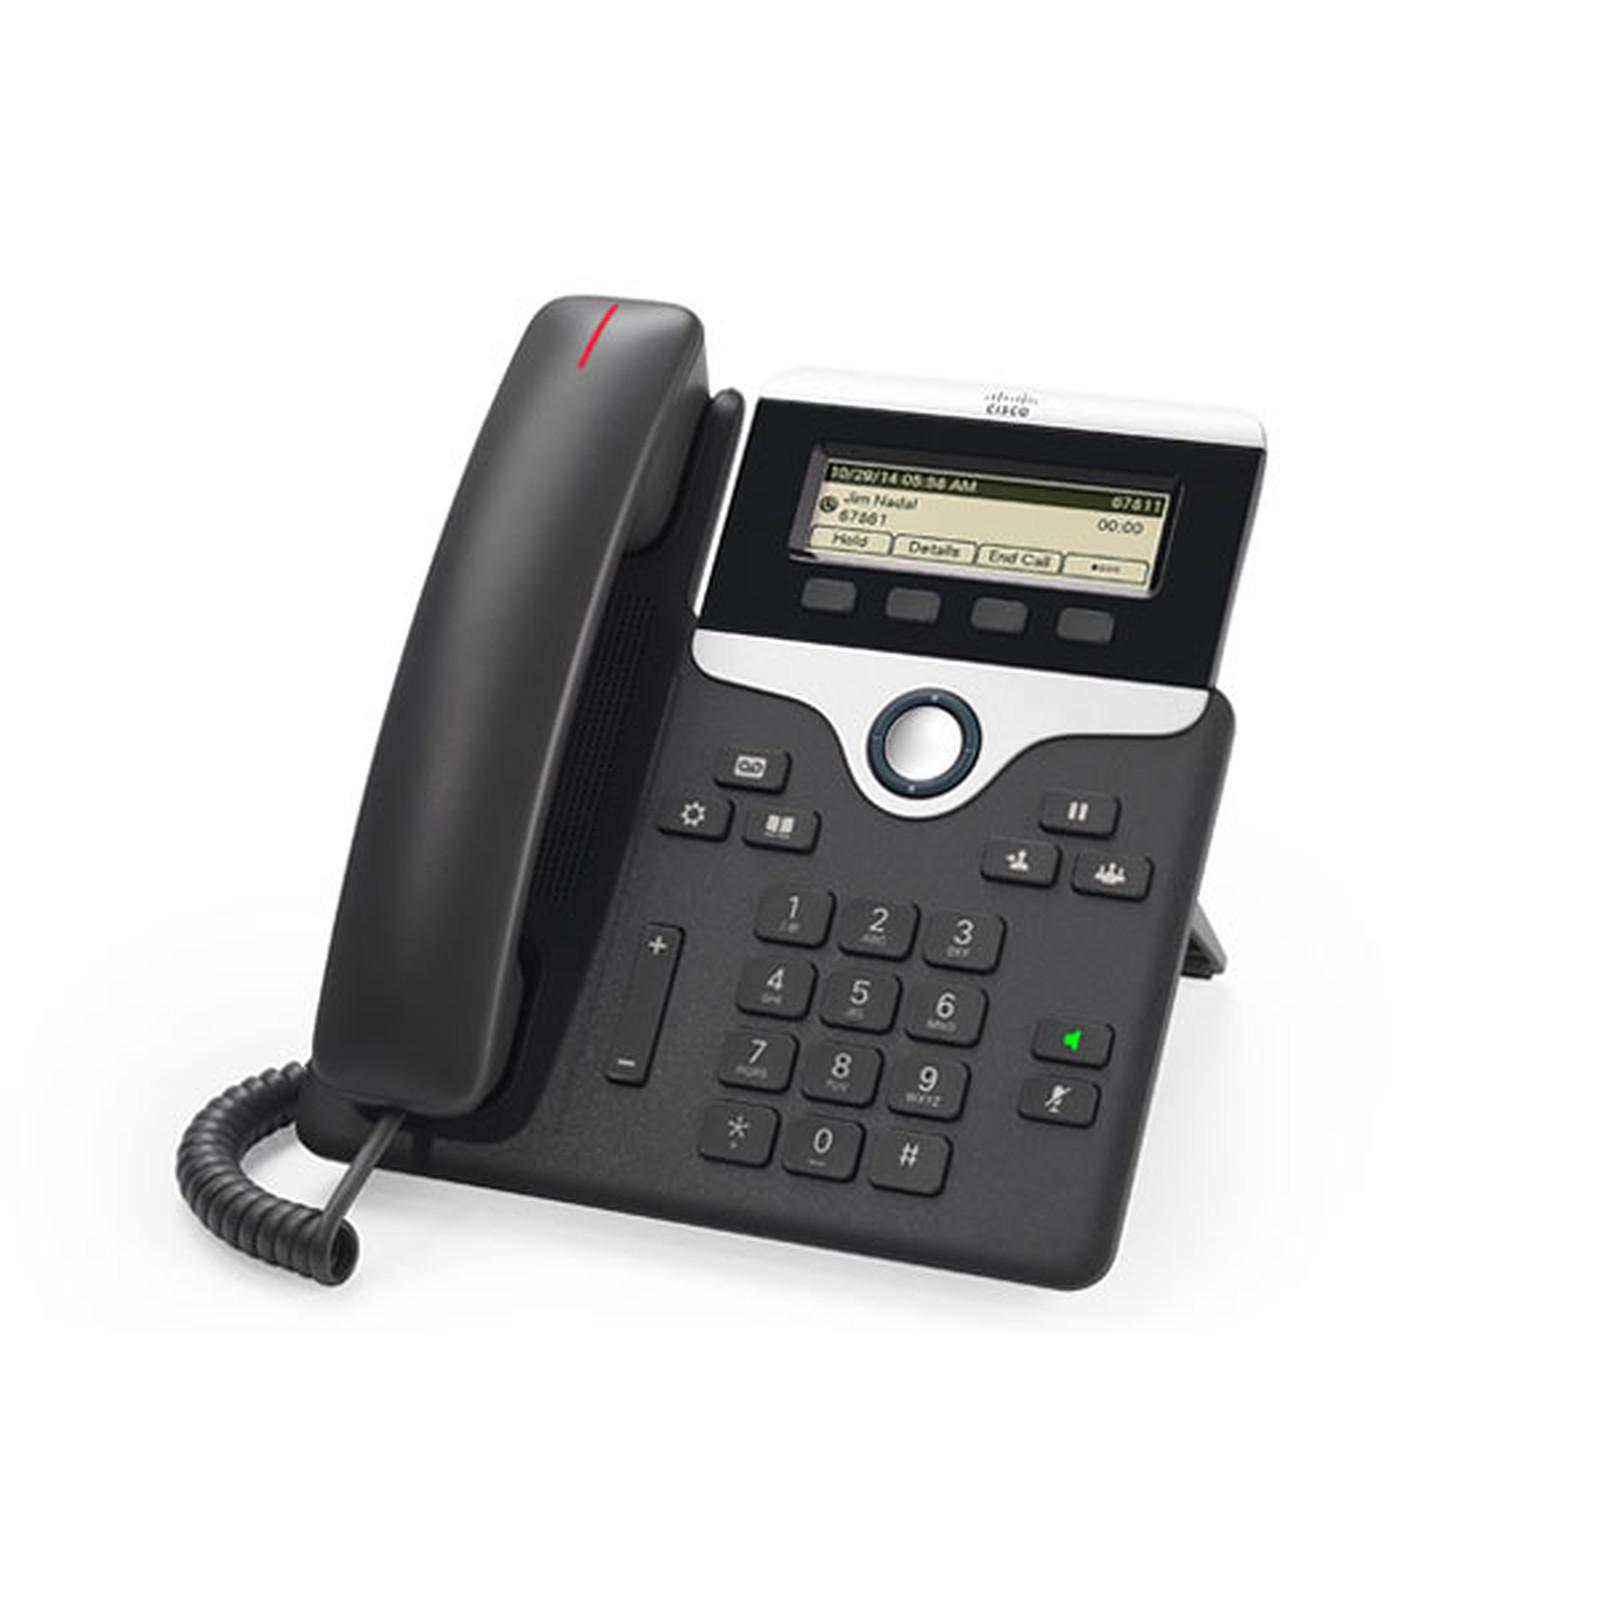 Cisco IP Phone 7811 avec micrologiciel de téléphone multiplateforme